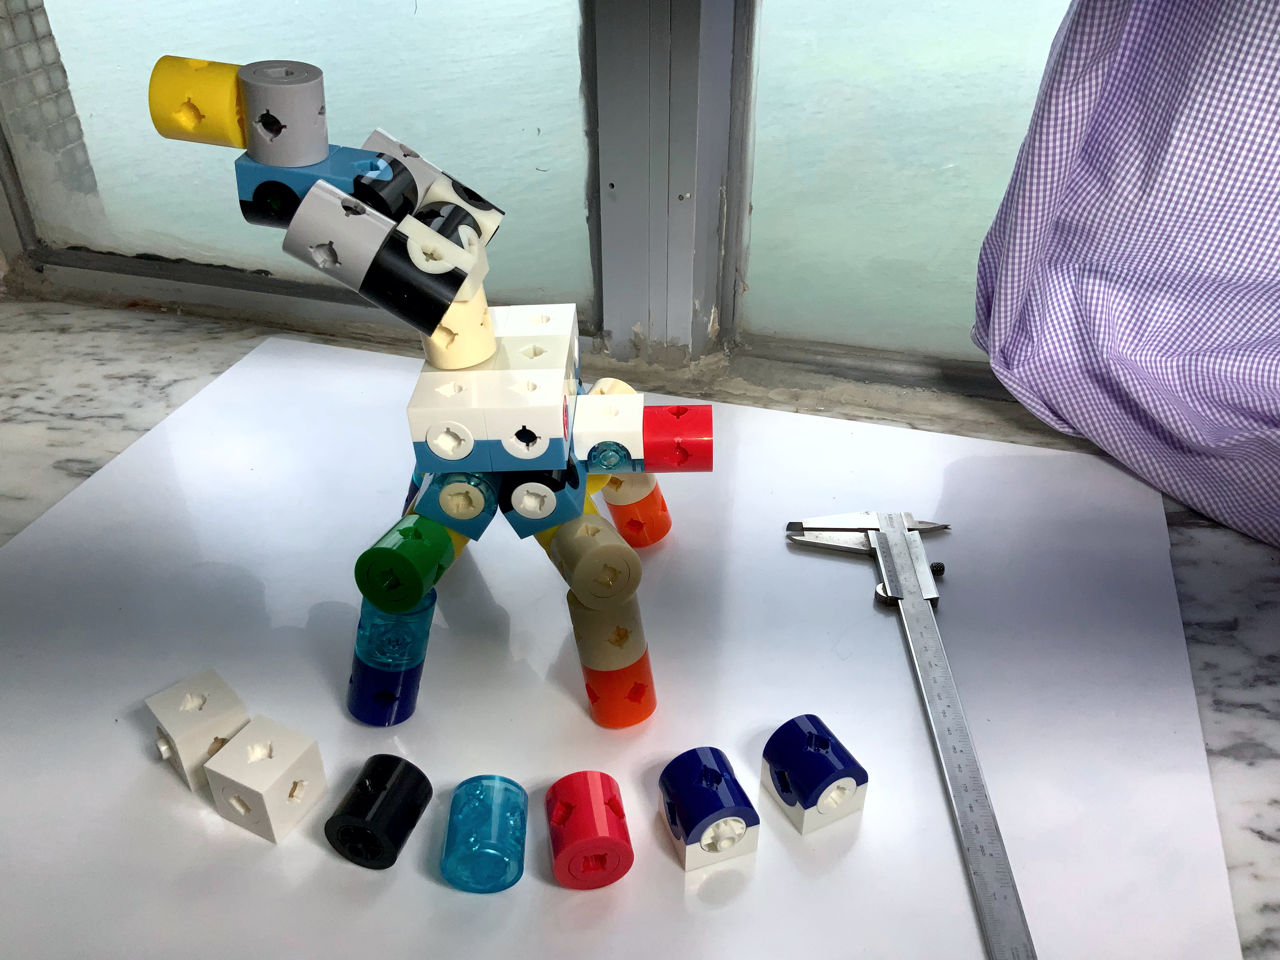 Cube Building Blocks like voxel, Assembly Walking Machine